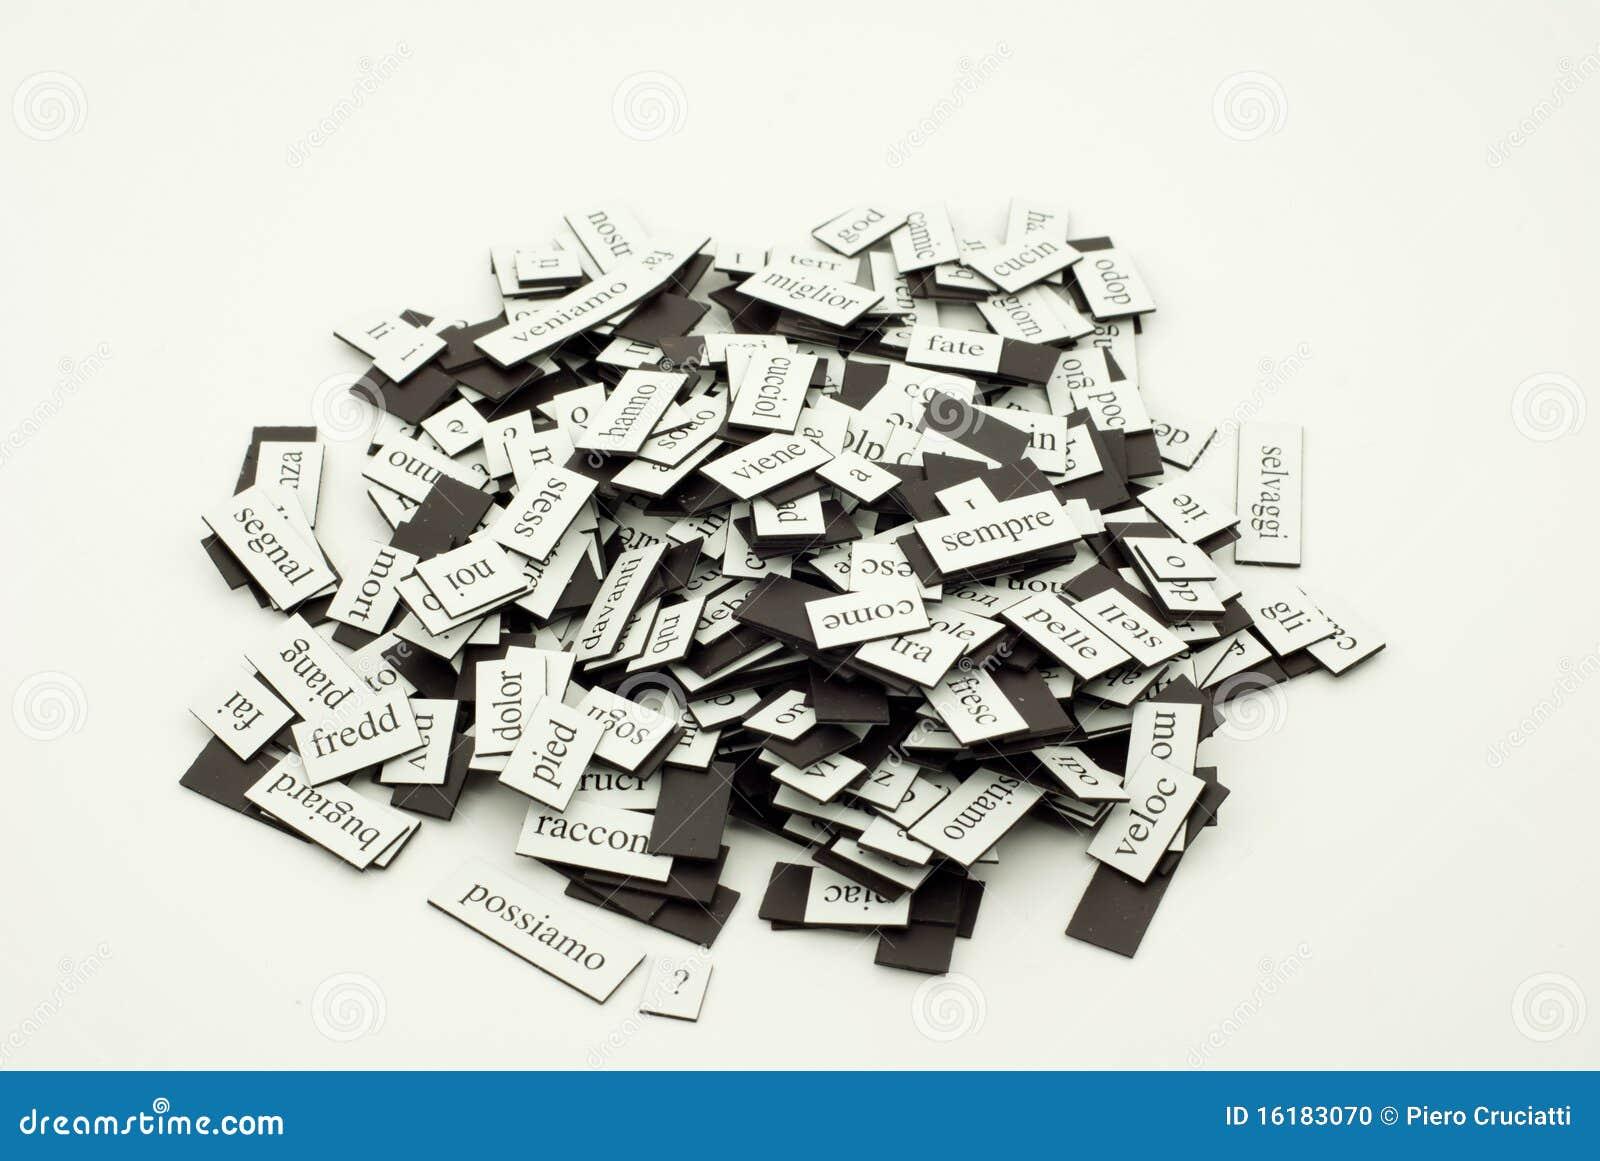 English In Italian: Pile Of Italian Words Stock Photo